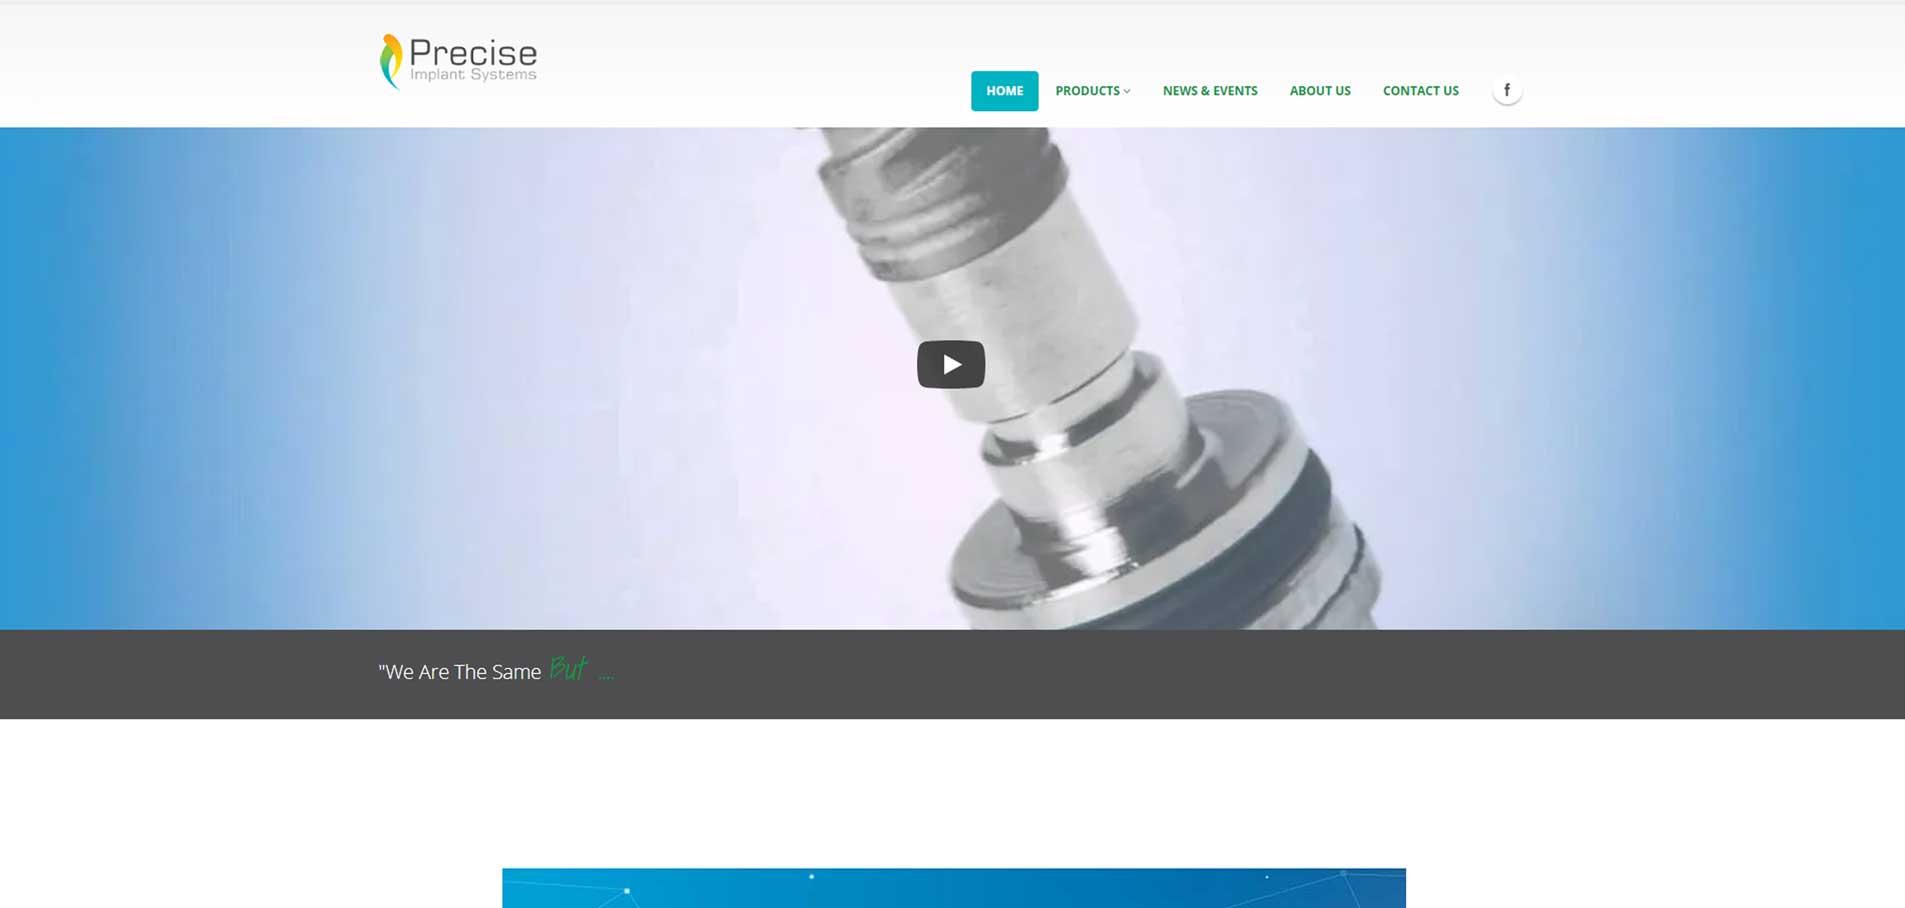 Precise webpage1